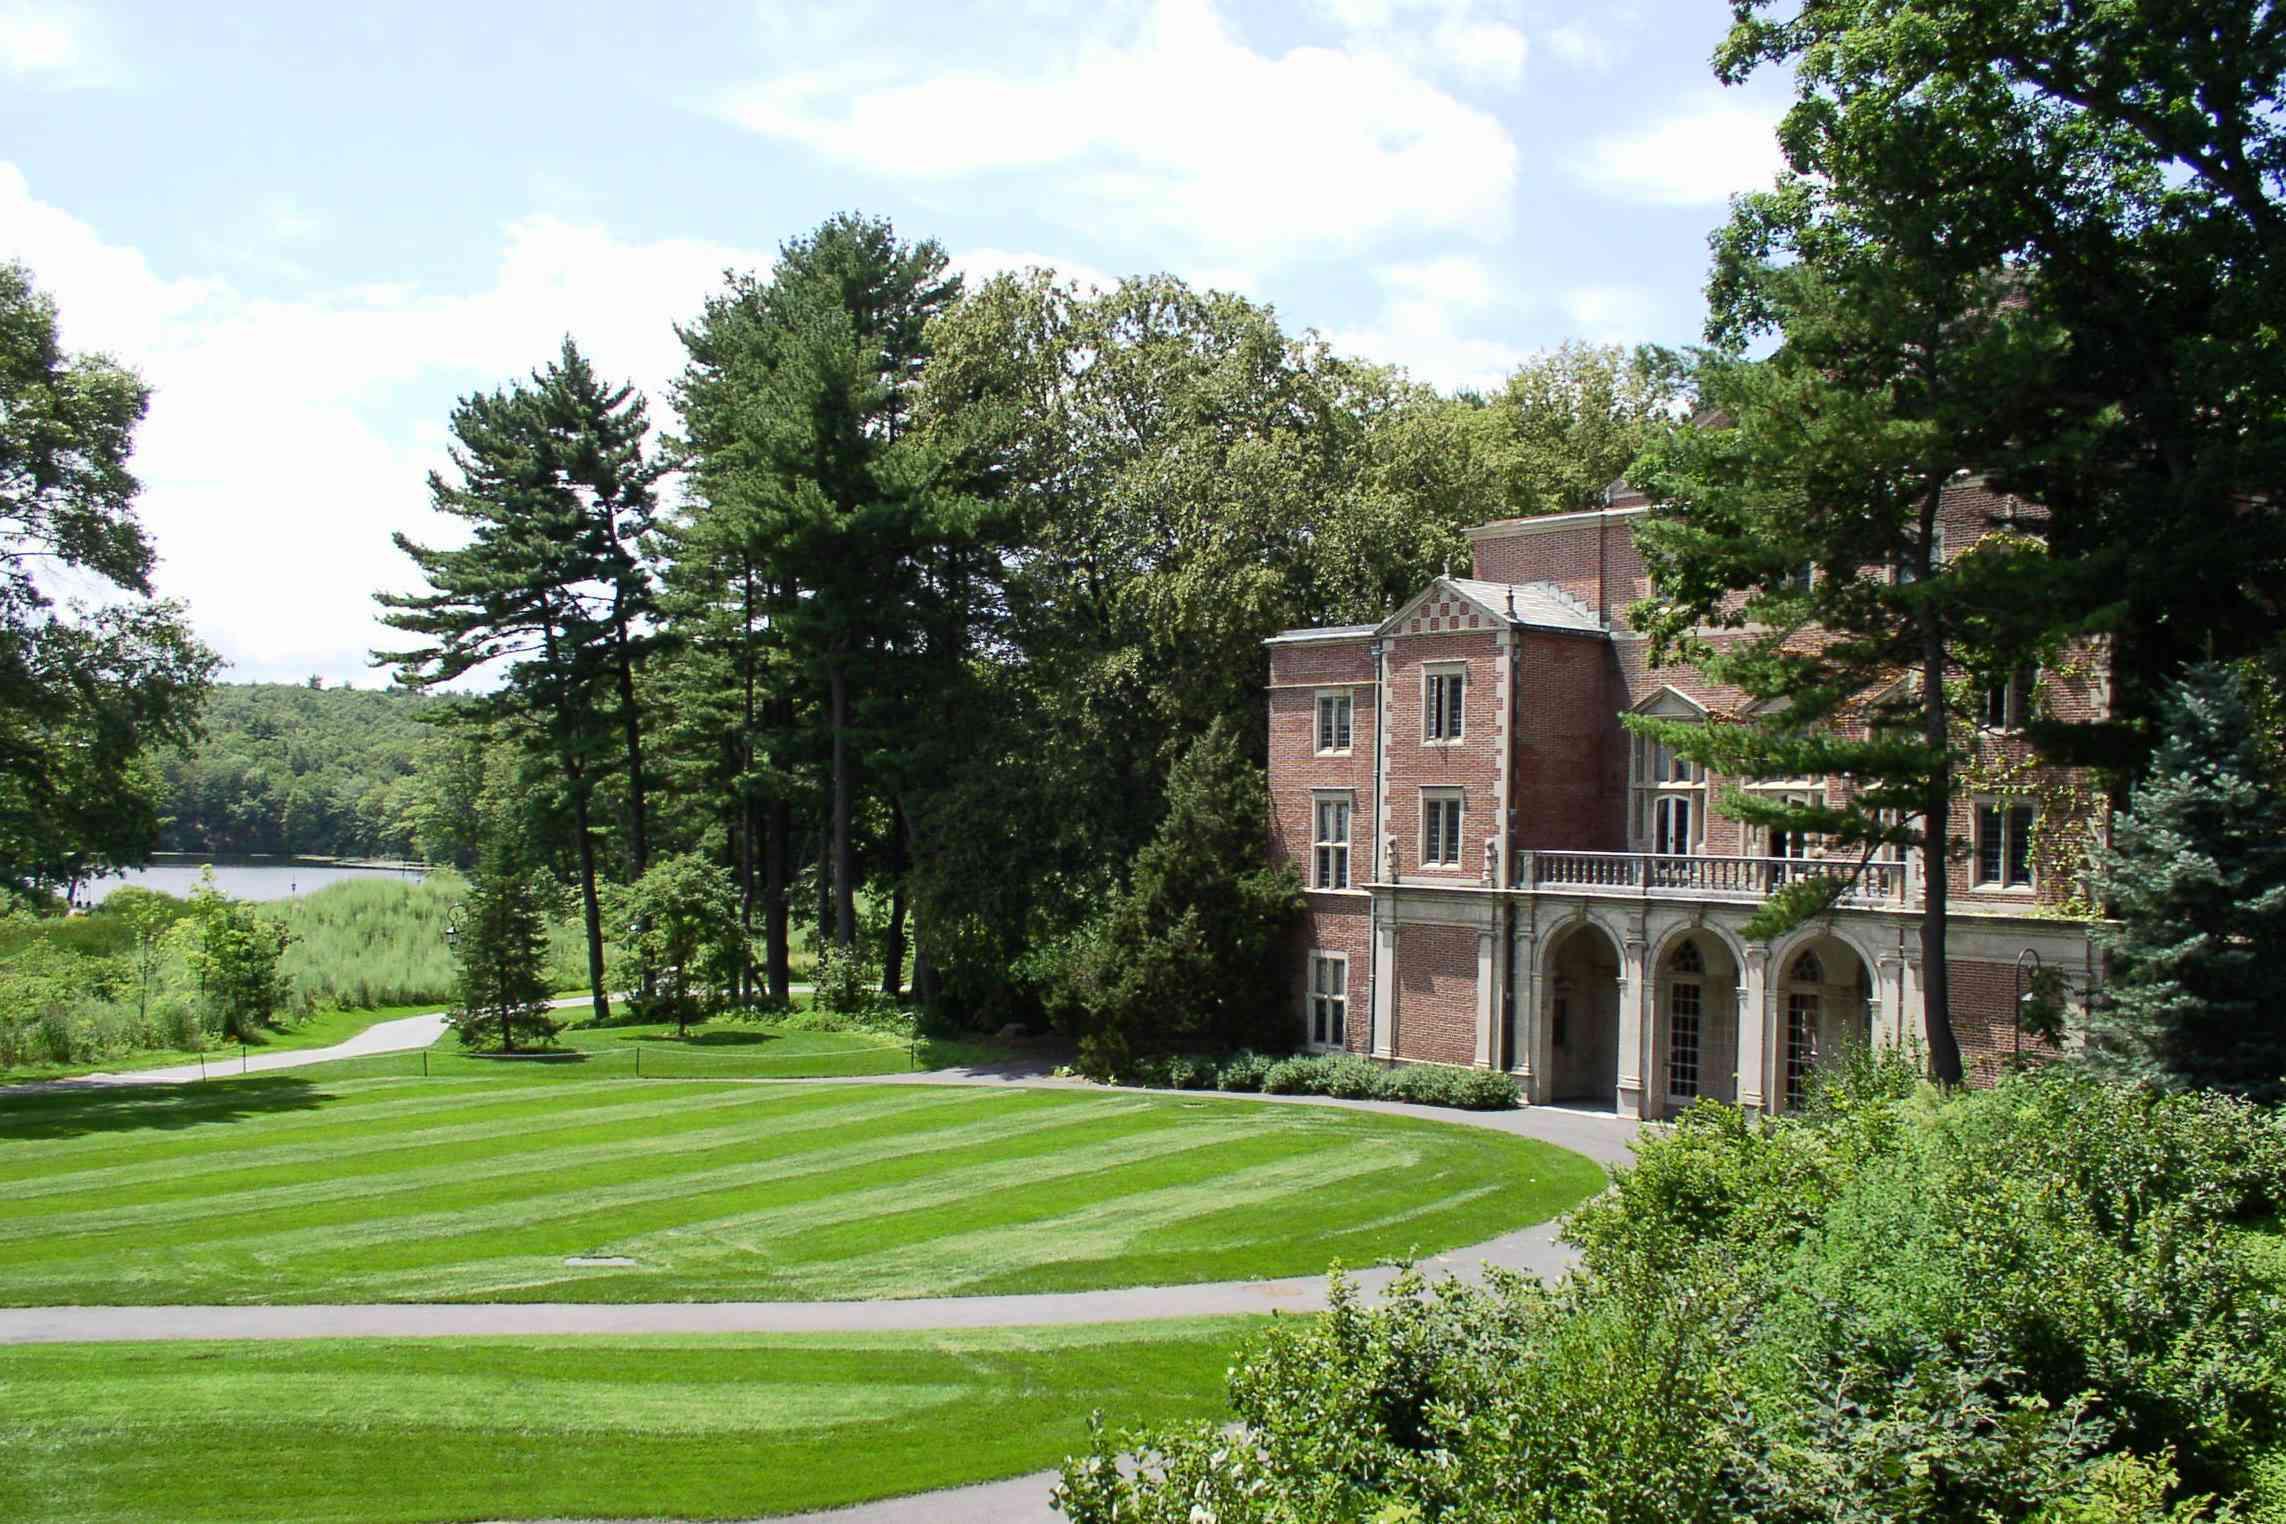 Alumni Hall at Wellesley College